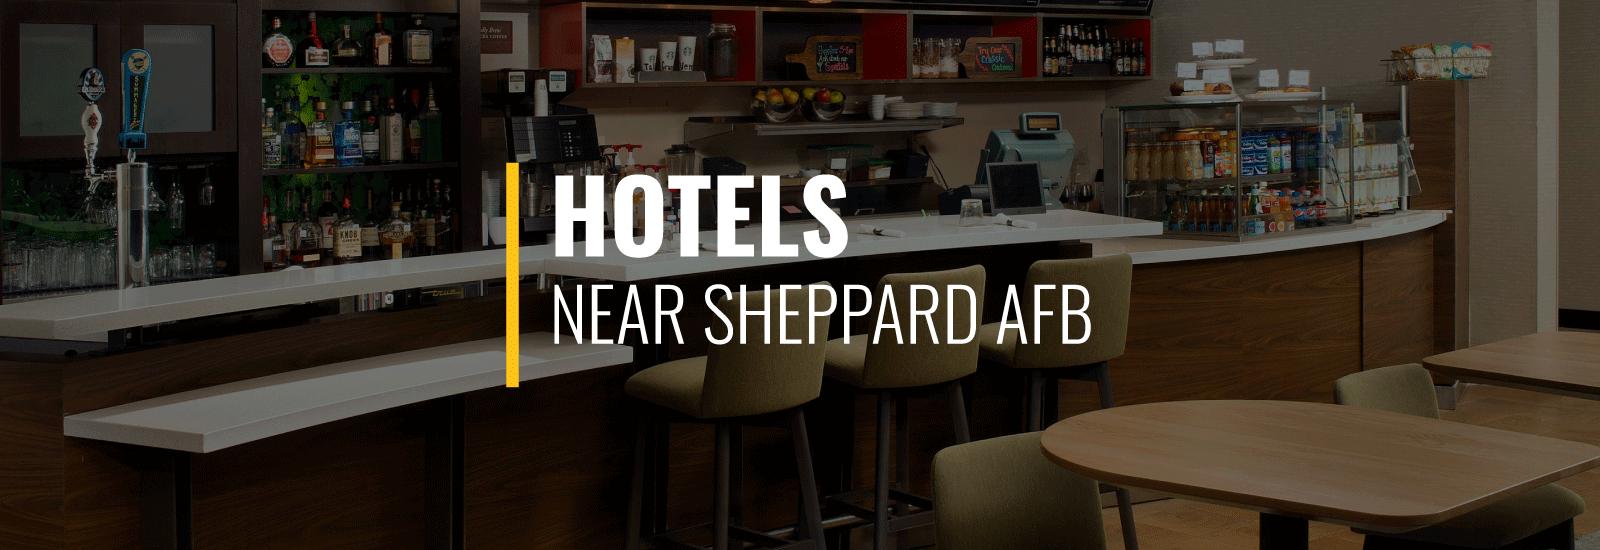 Sheppard AFB Hotels